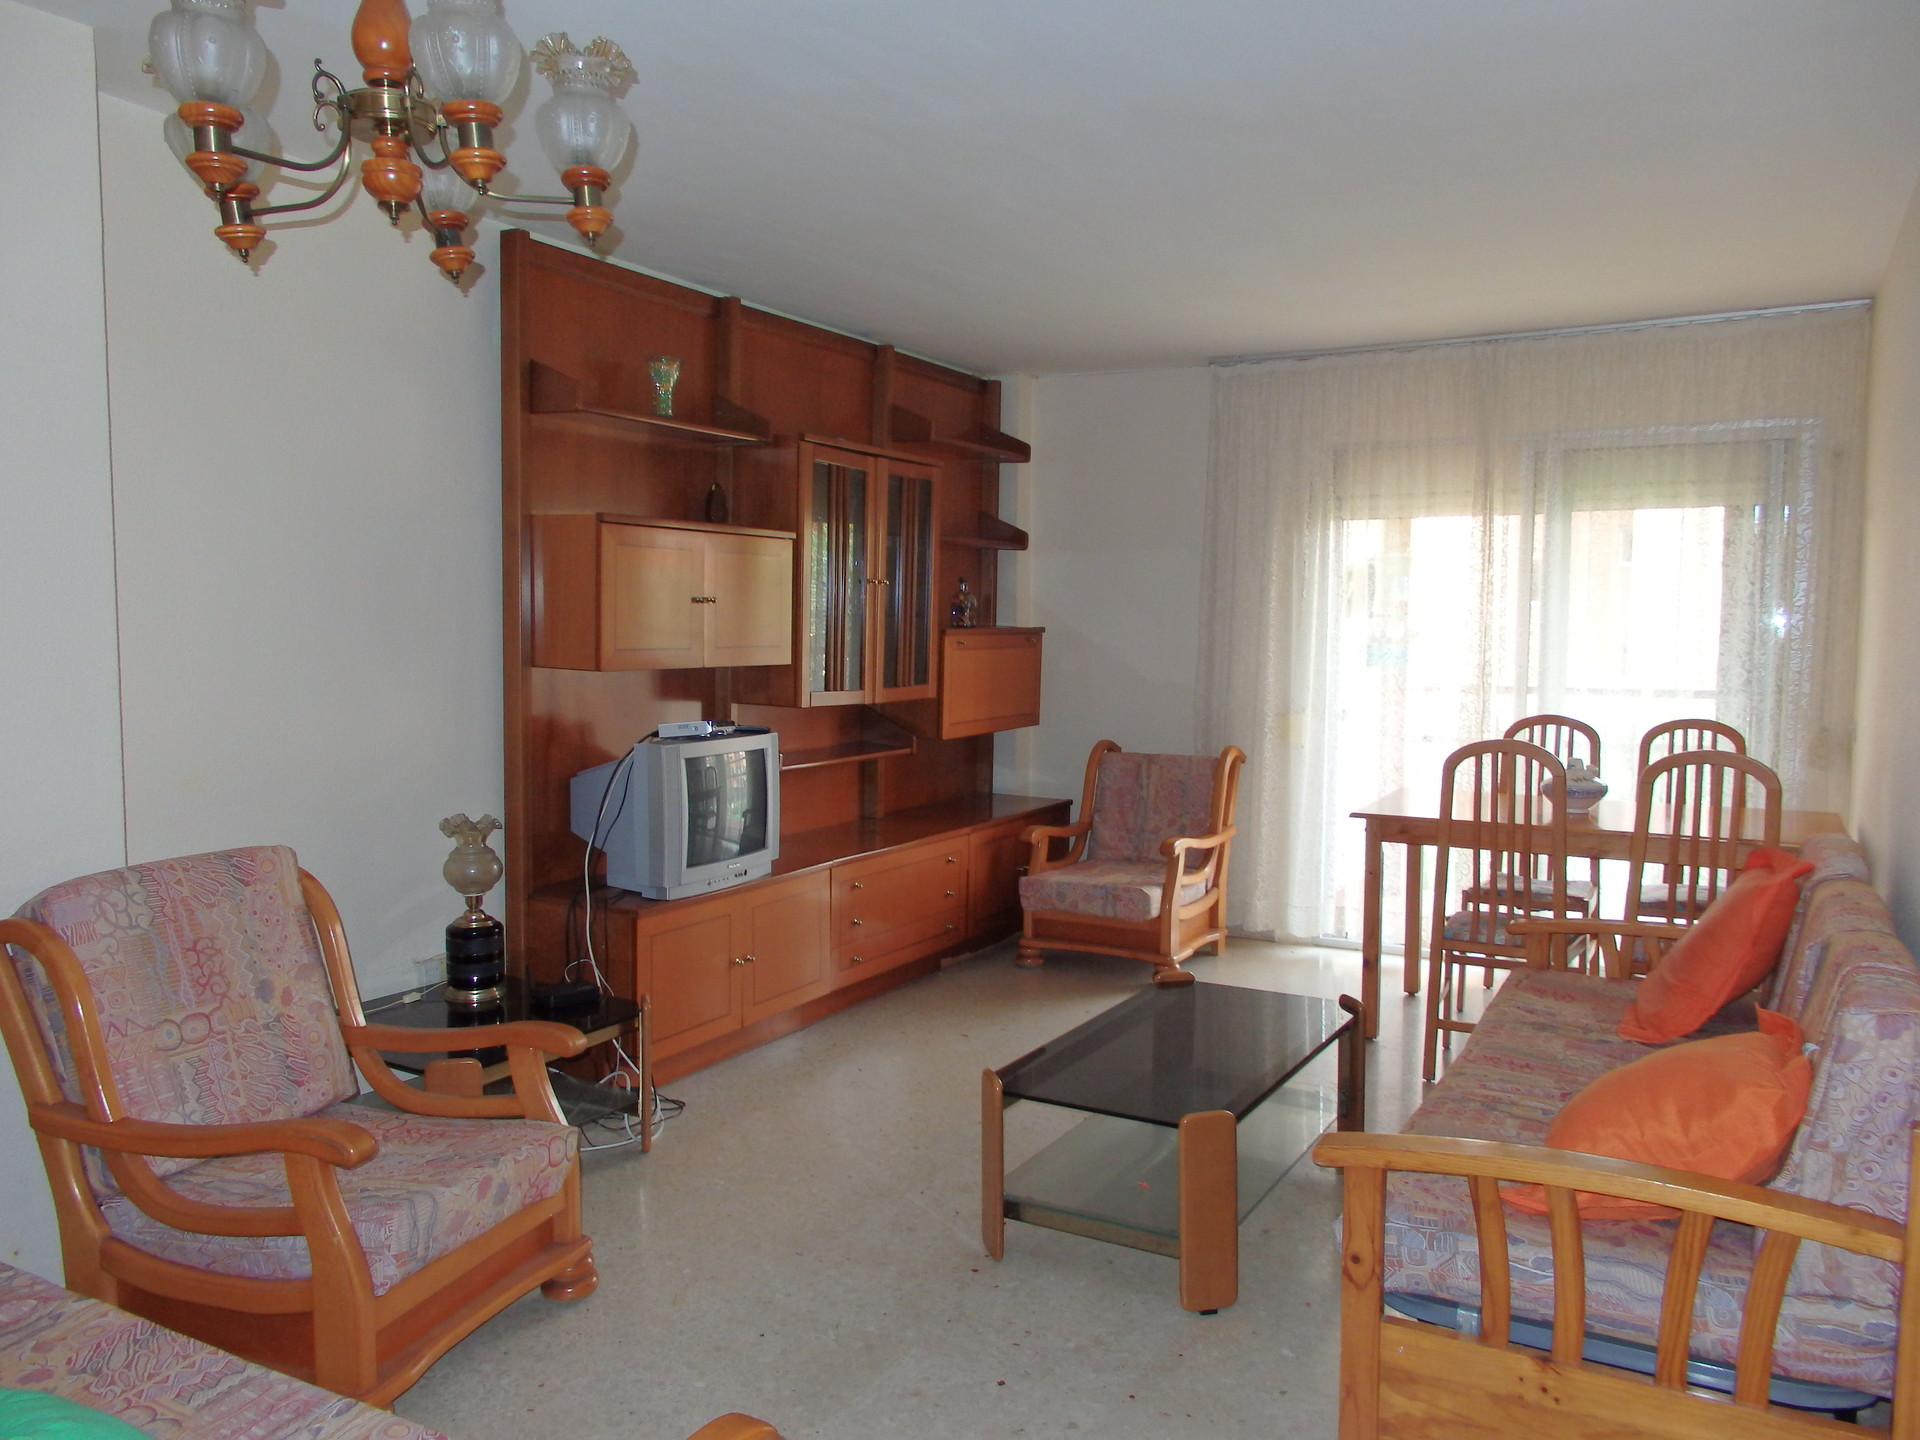 Benalm dena m laga habitaci n en piso compartido for Alquiler de habitacion en piso compartido